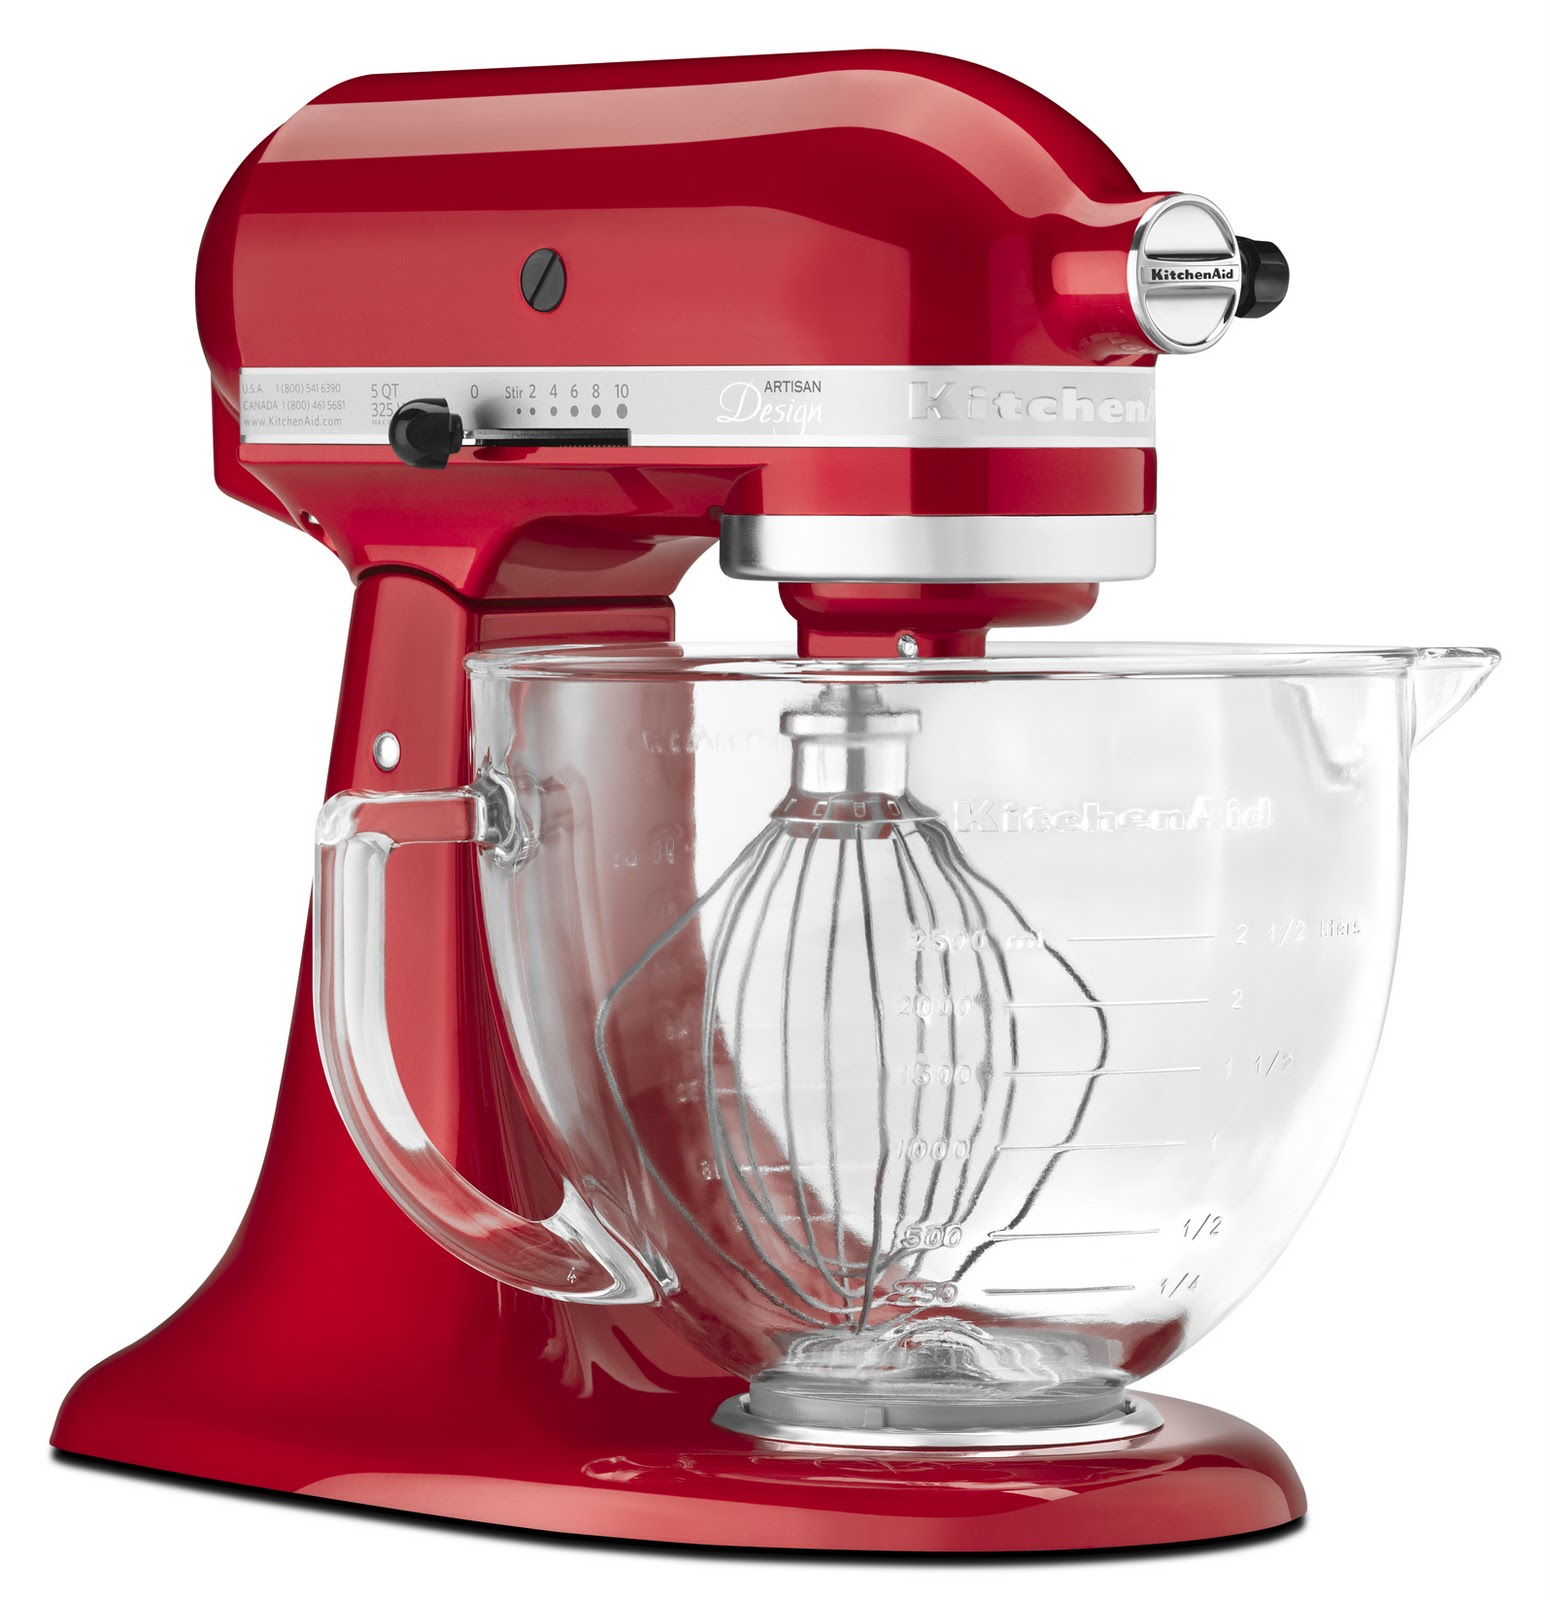 kitchen mixers european gadgets kitchenaid mixer well designed objects